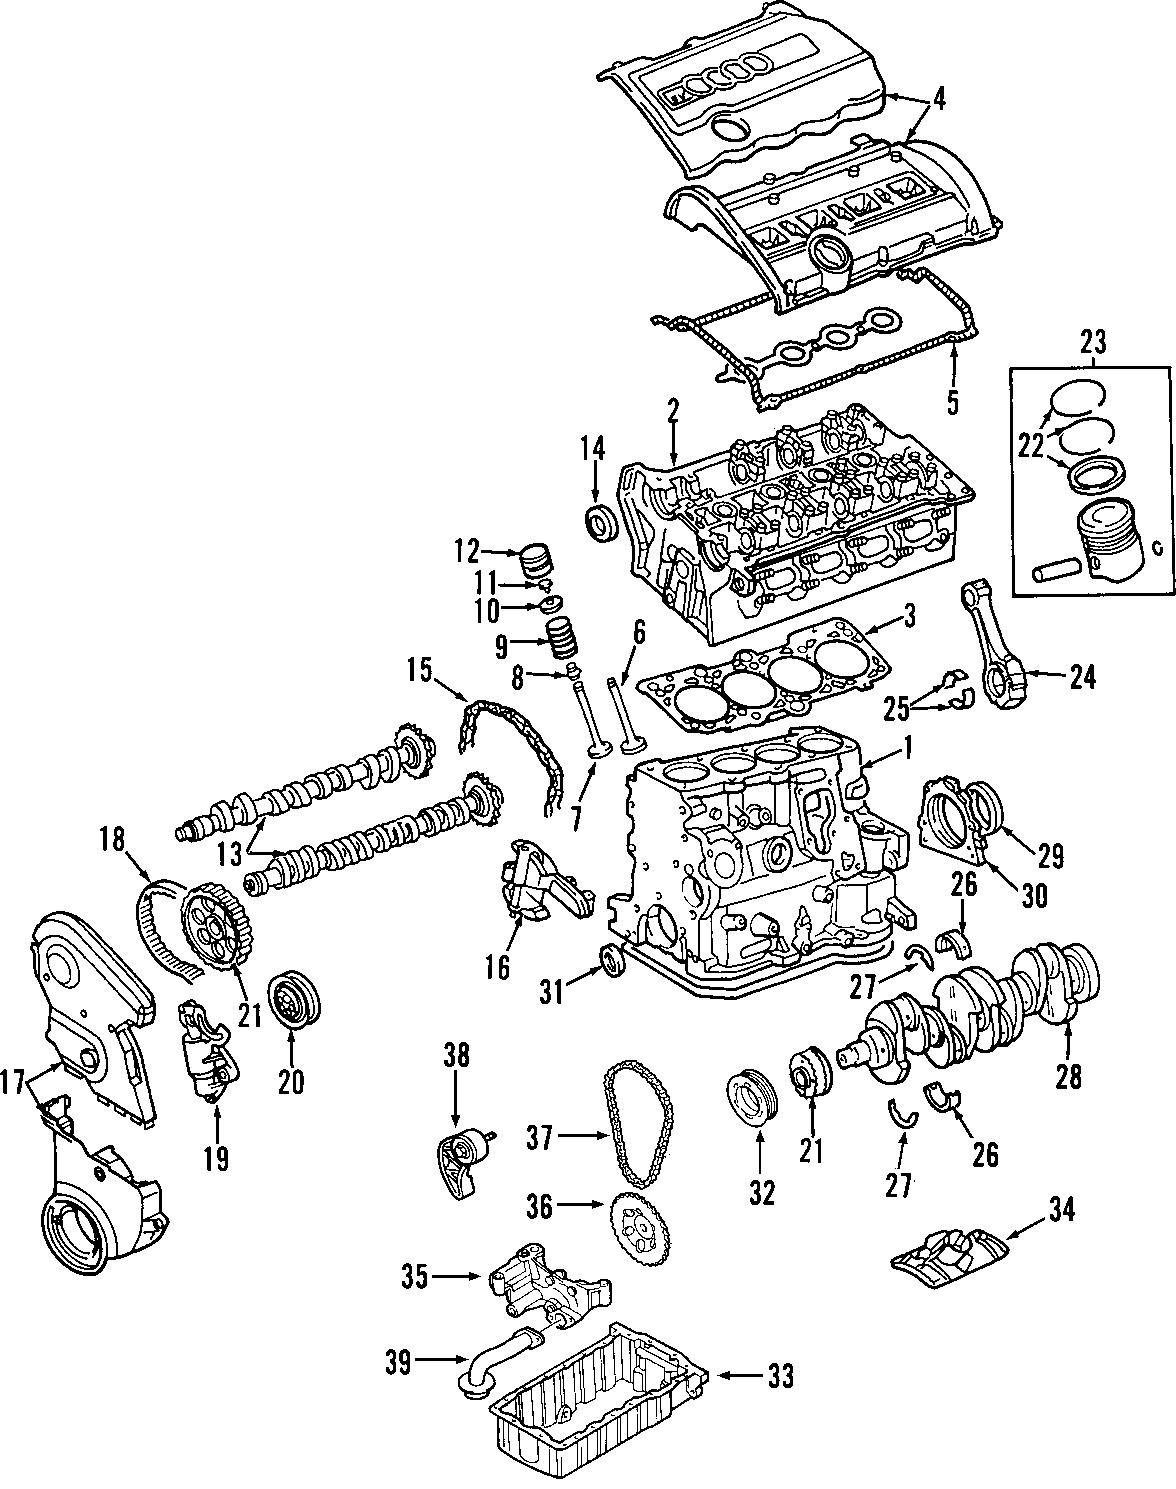 Subaru Robin Eh035ax0203 Parts List And Diagram Ereplacementparts